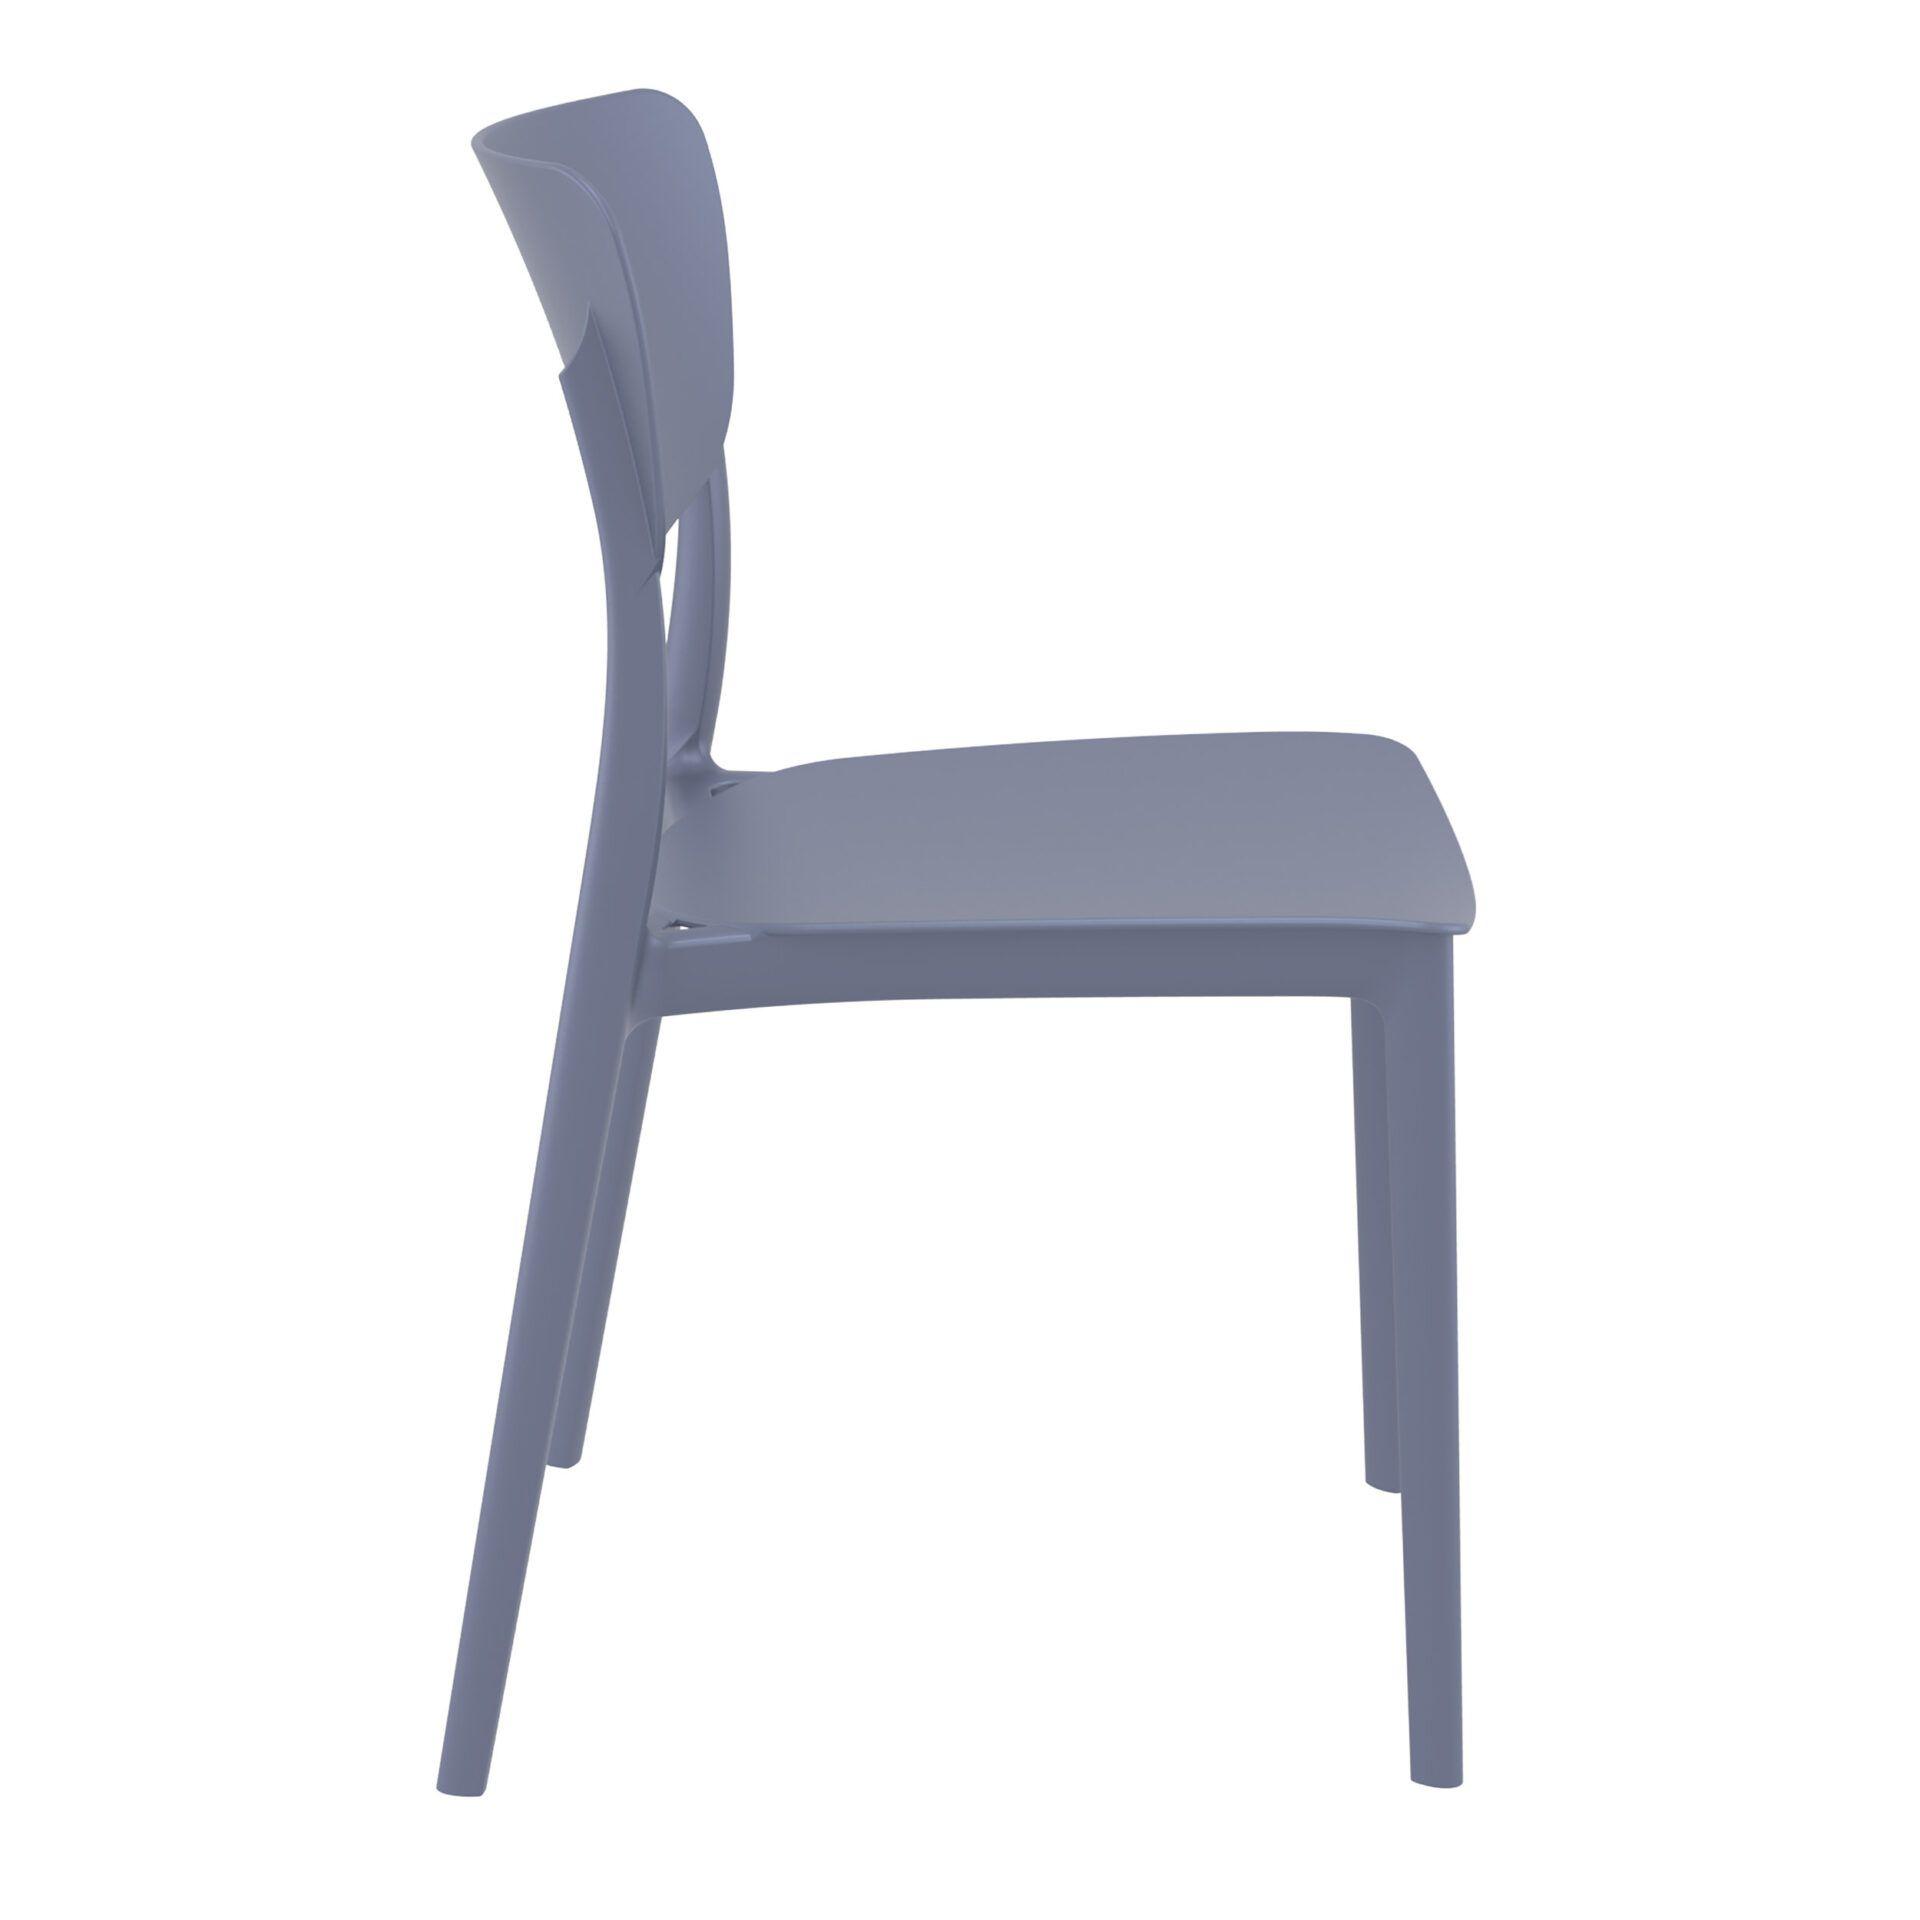 polypropylene outdoor dining monna chair darkgrey side